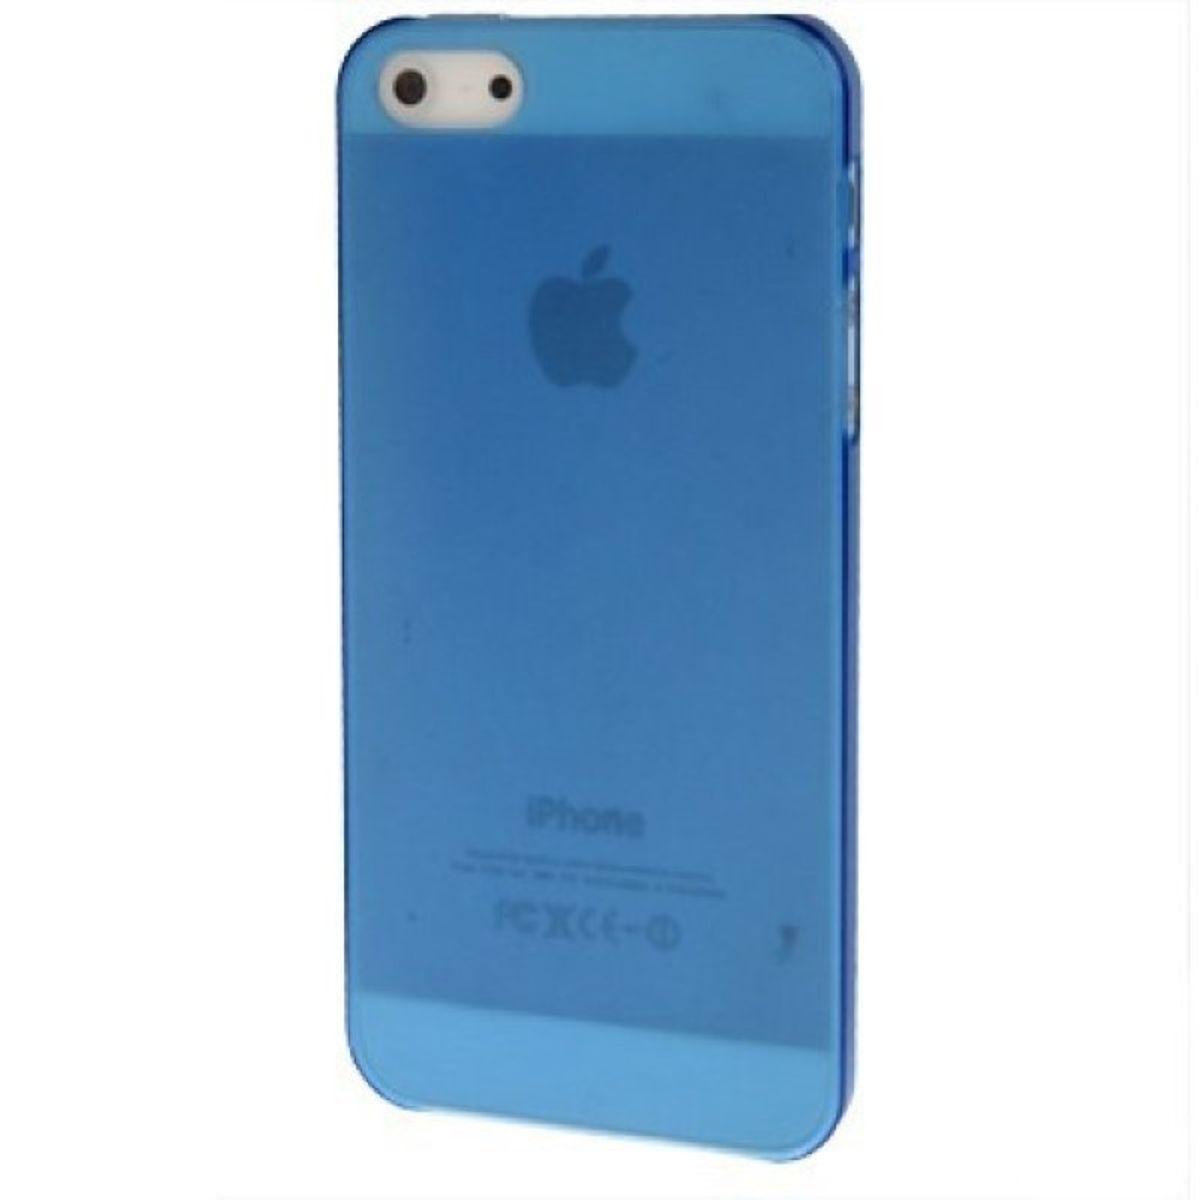 Schutzhülle Ultra Dünn Hülle für Apple iPhone SE Transparent Blau